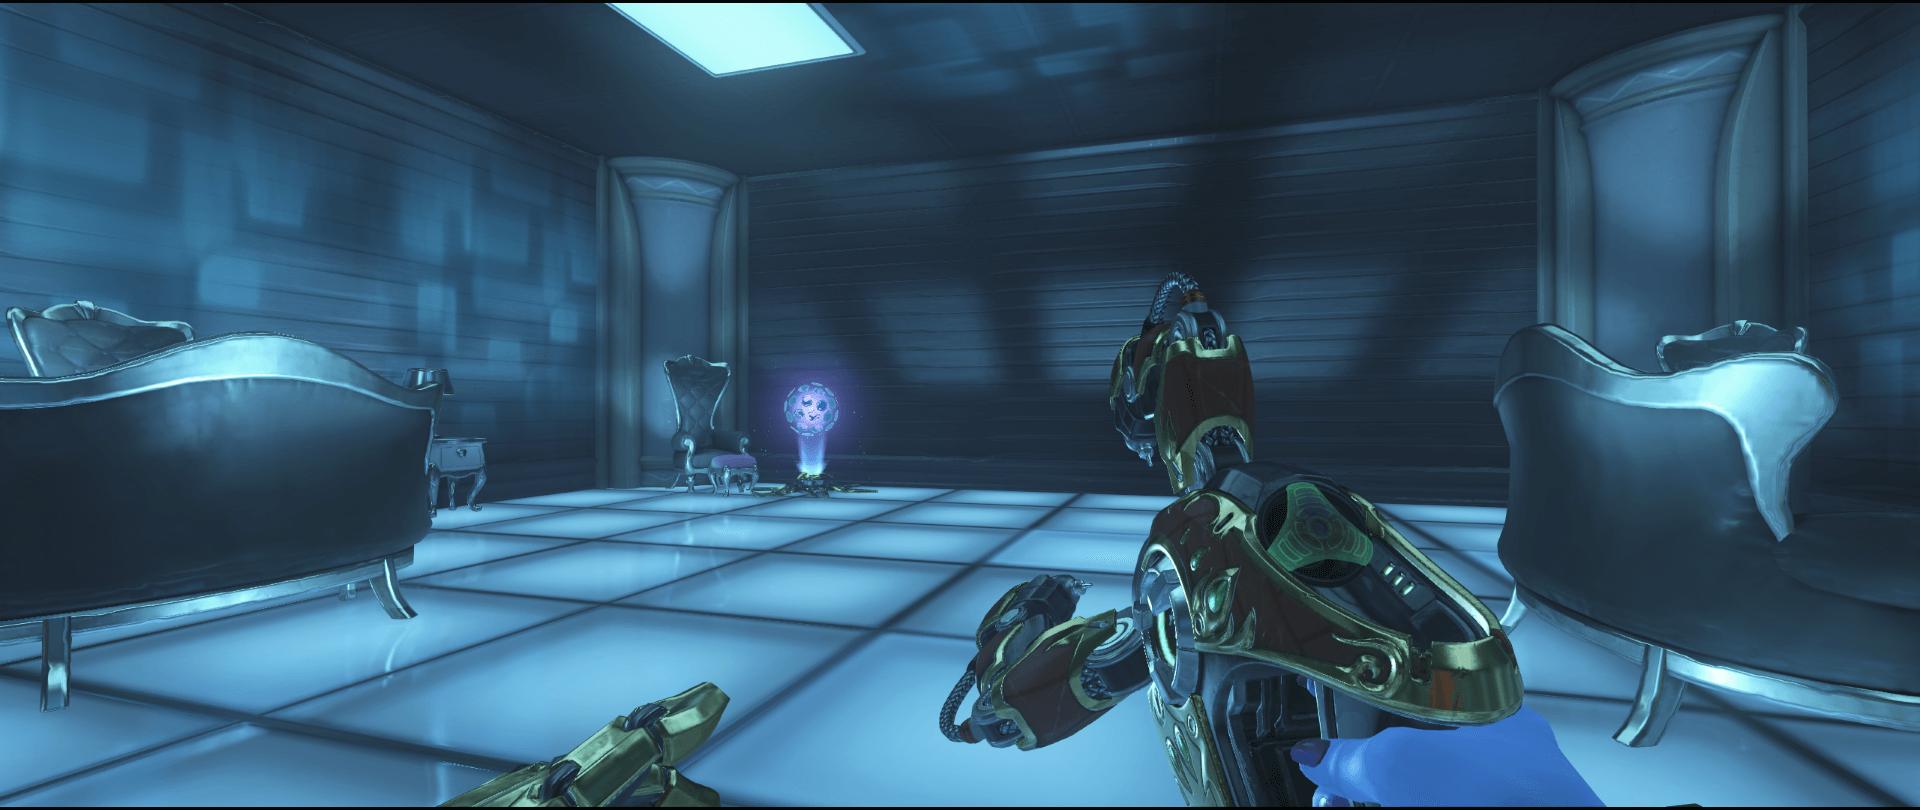 Symmetra shield generator spot Numbani blue room third point.png